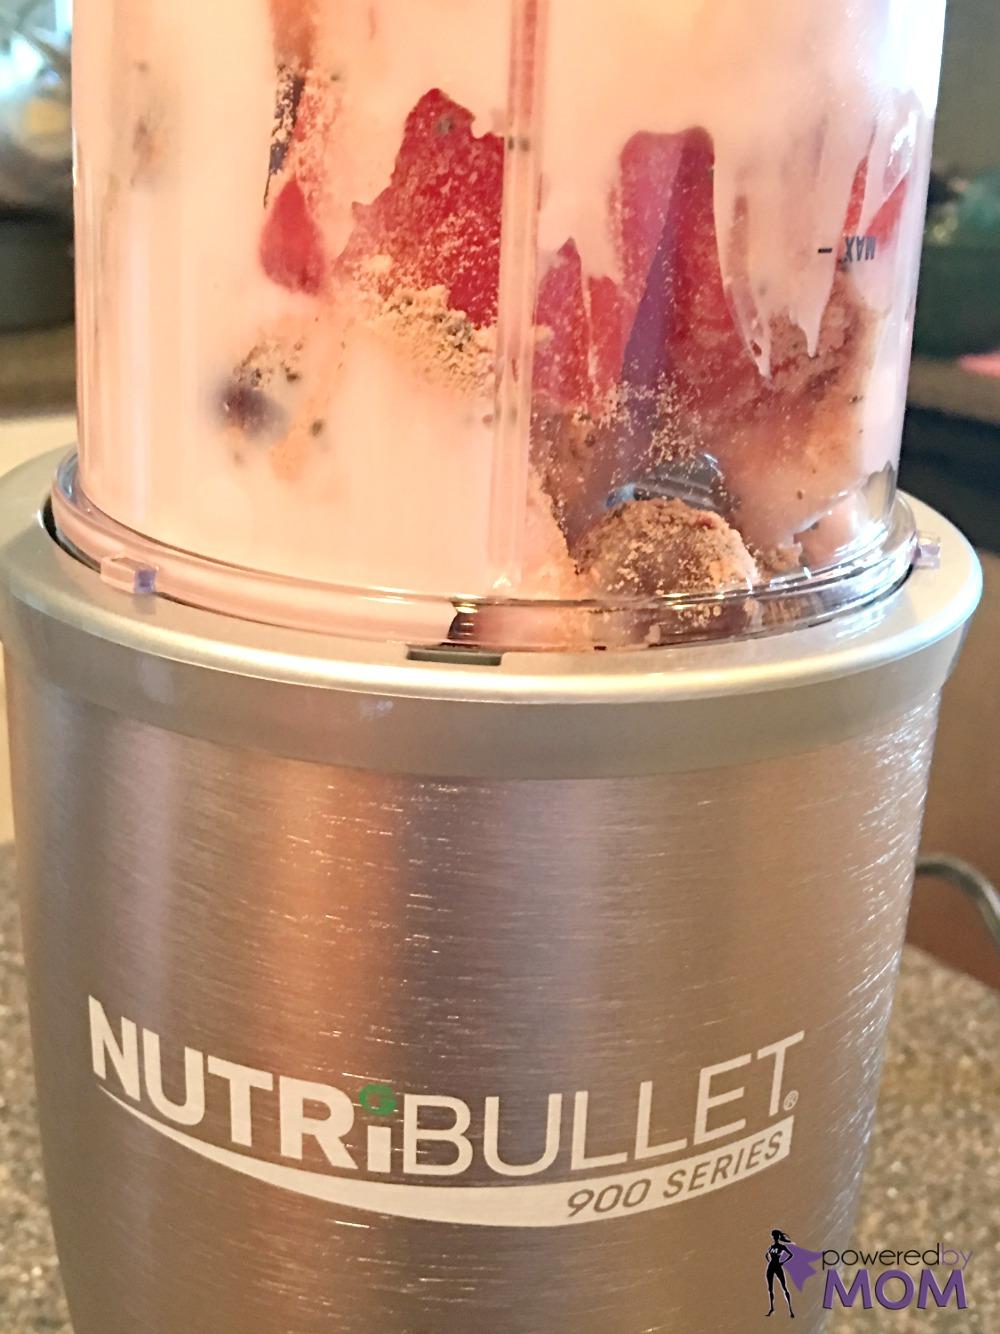 NutiBullet-review-5